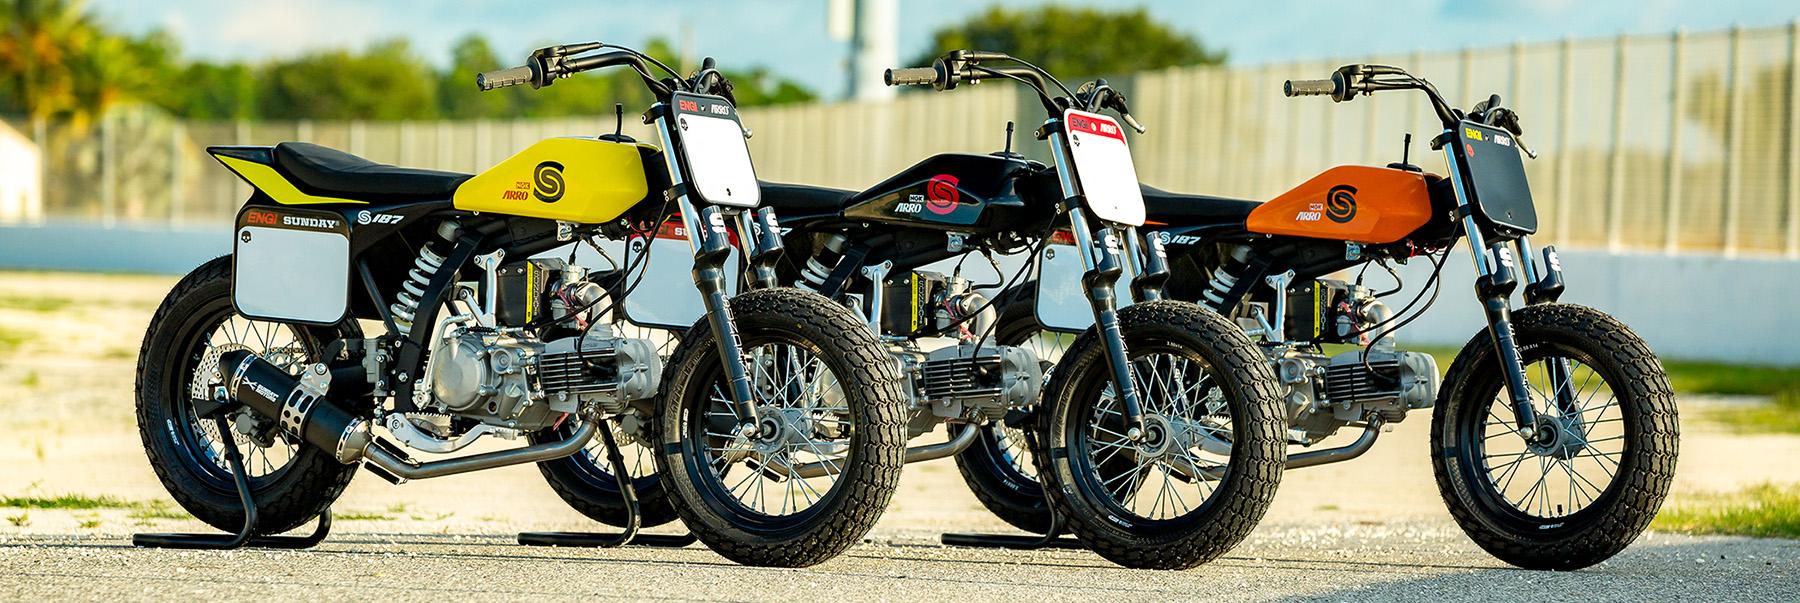 ycf moto slide 7